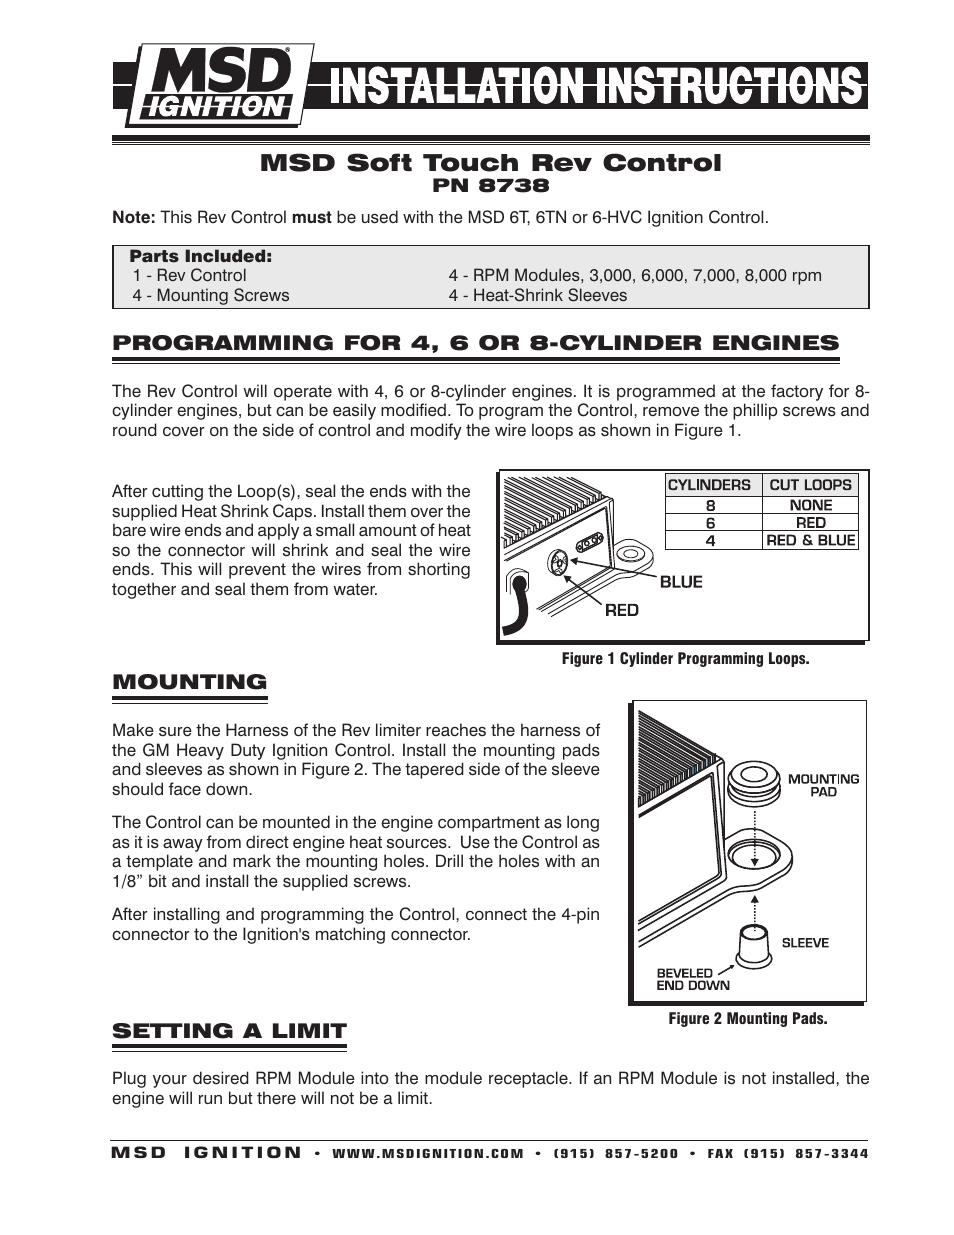 50 Amp Rv Extension Cord Wiring Diagram   Wiring Liry F Wiring Diagram Reznor on